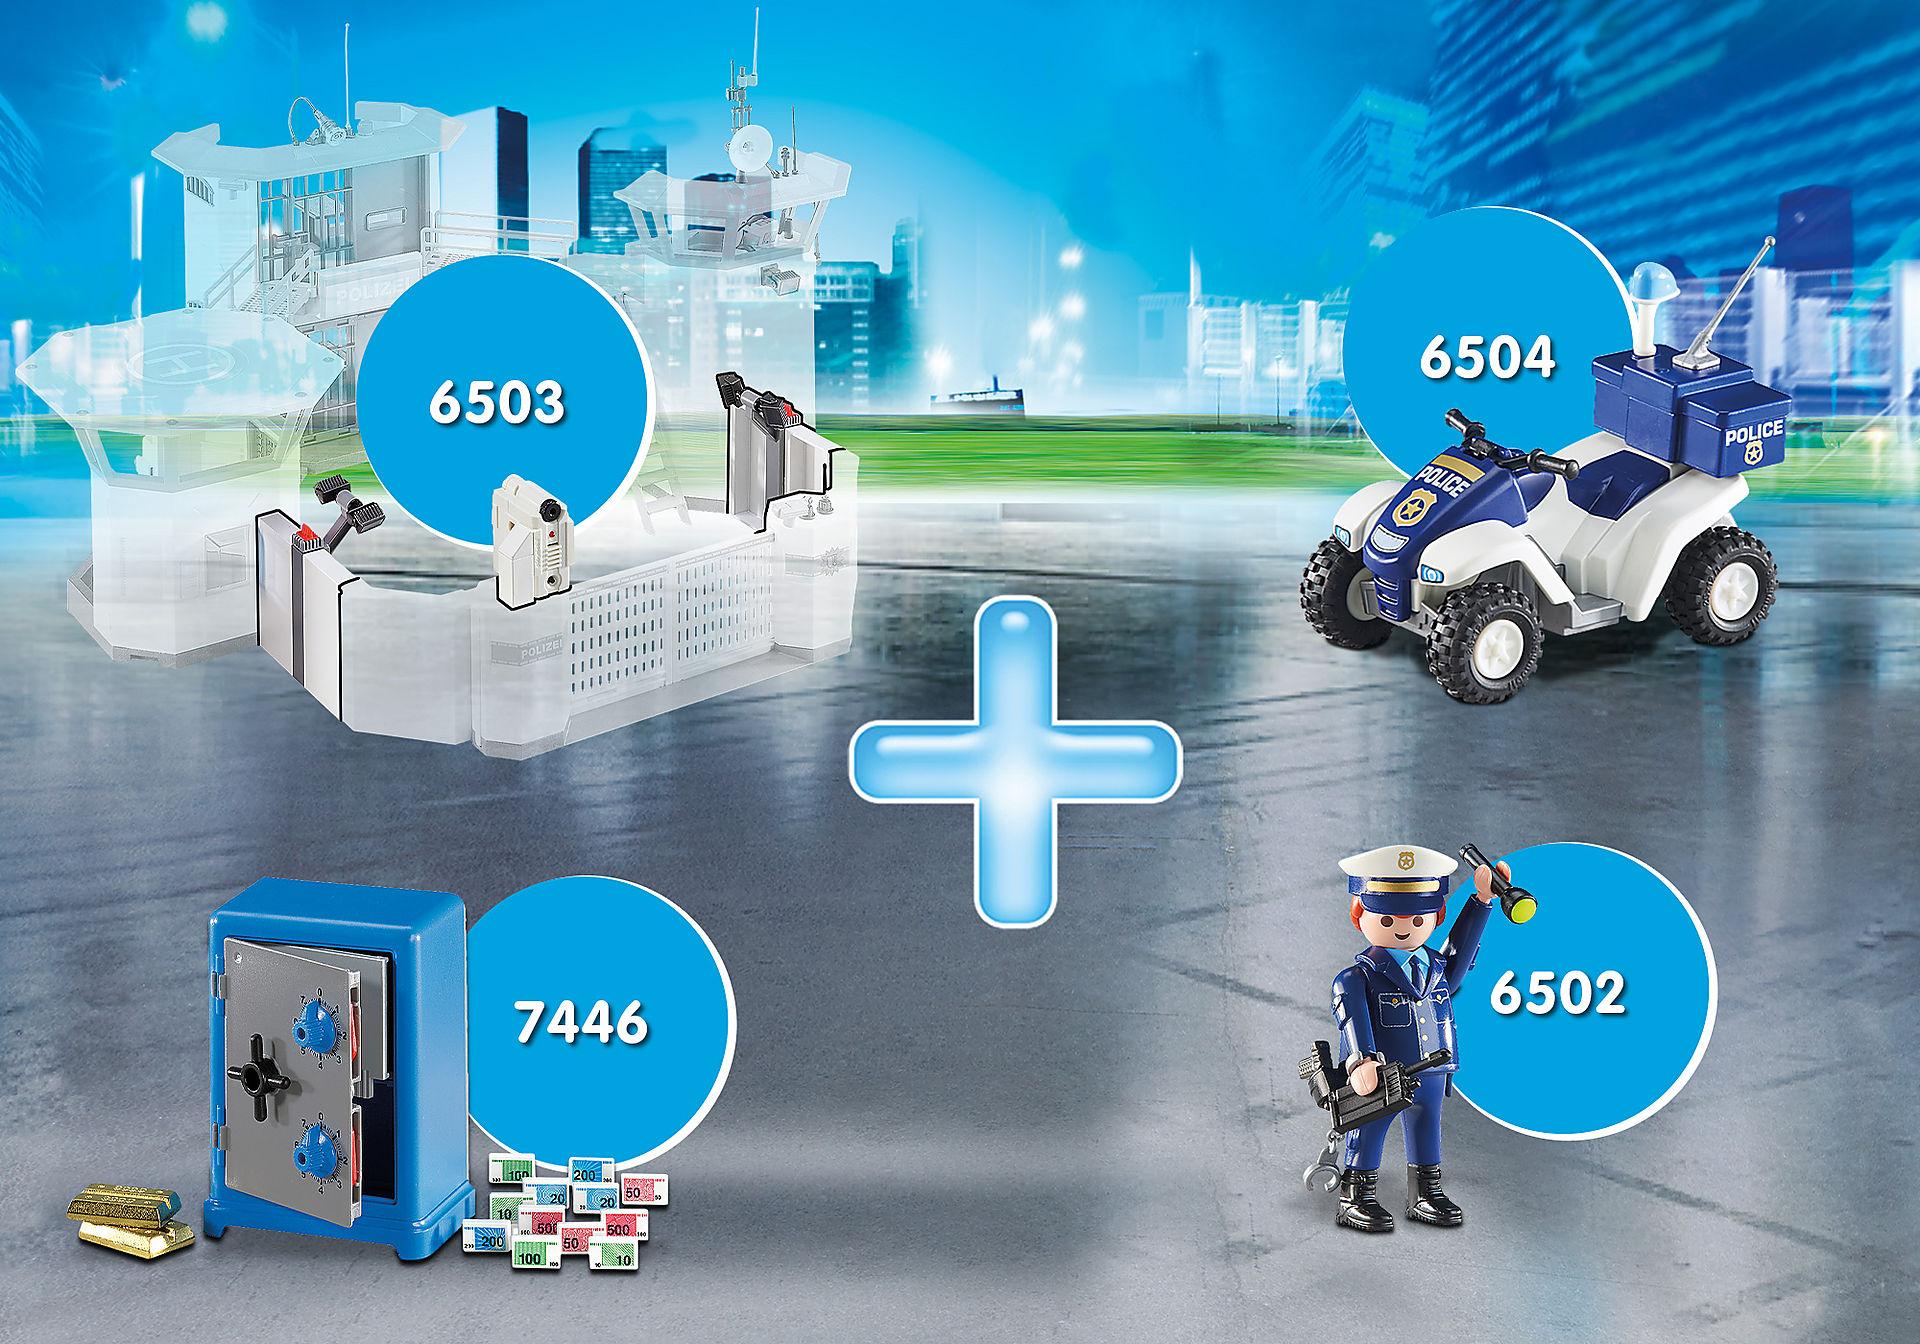 PM2012I supplement bundle police zoom image1